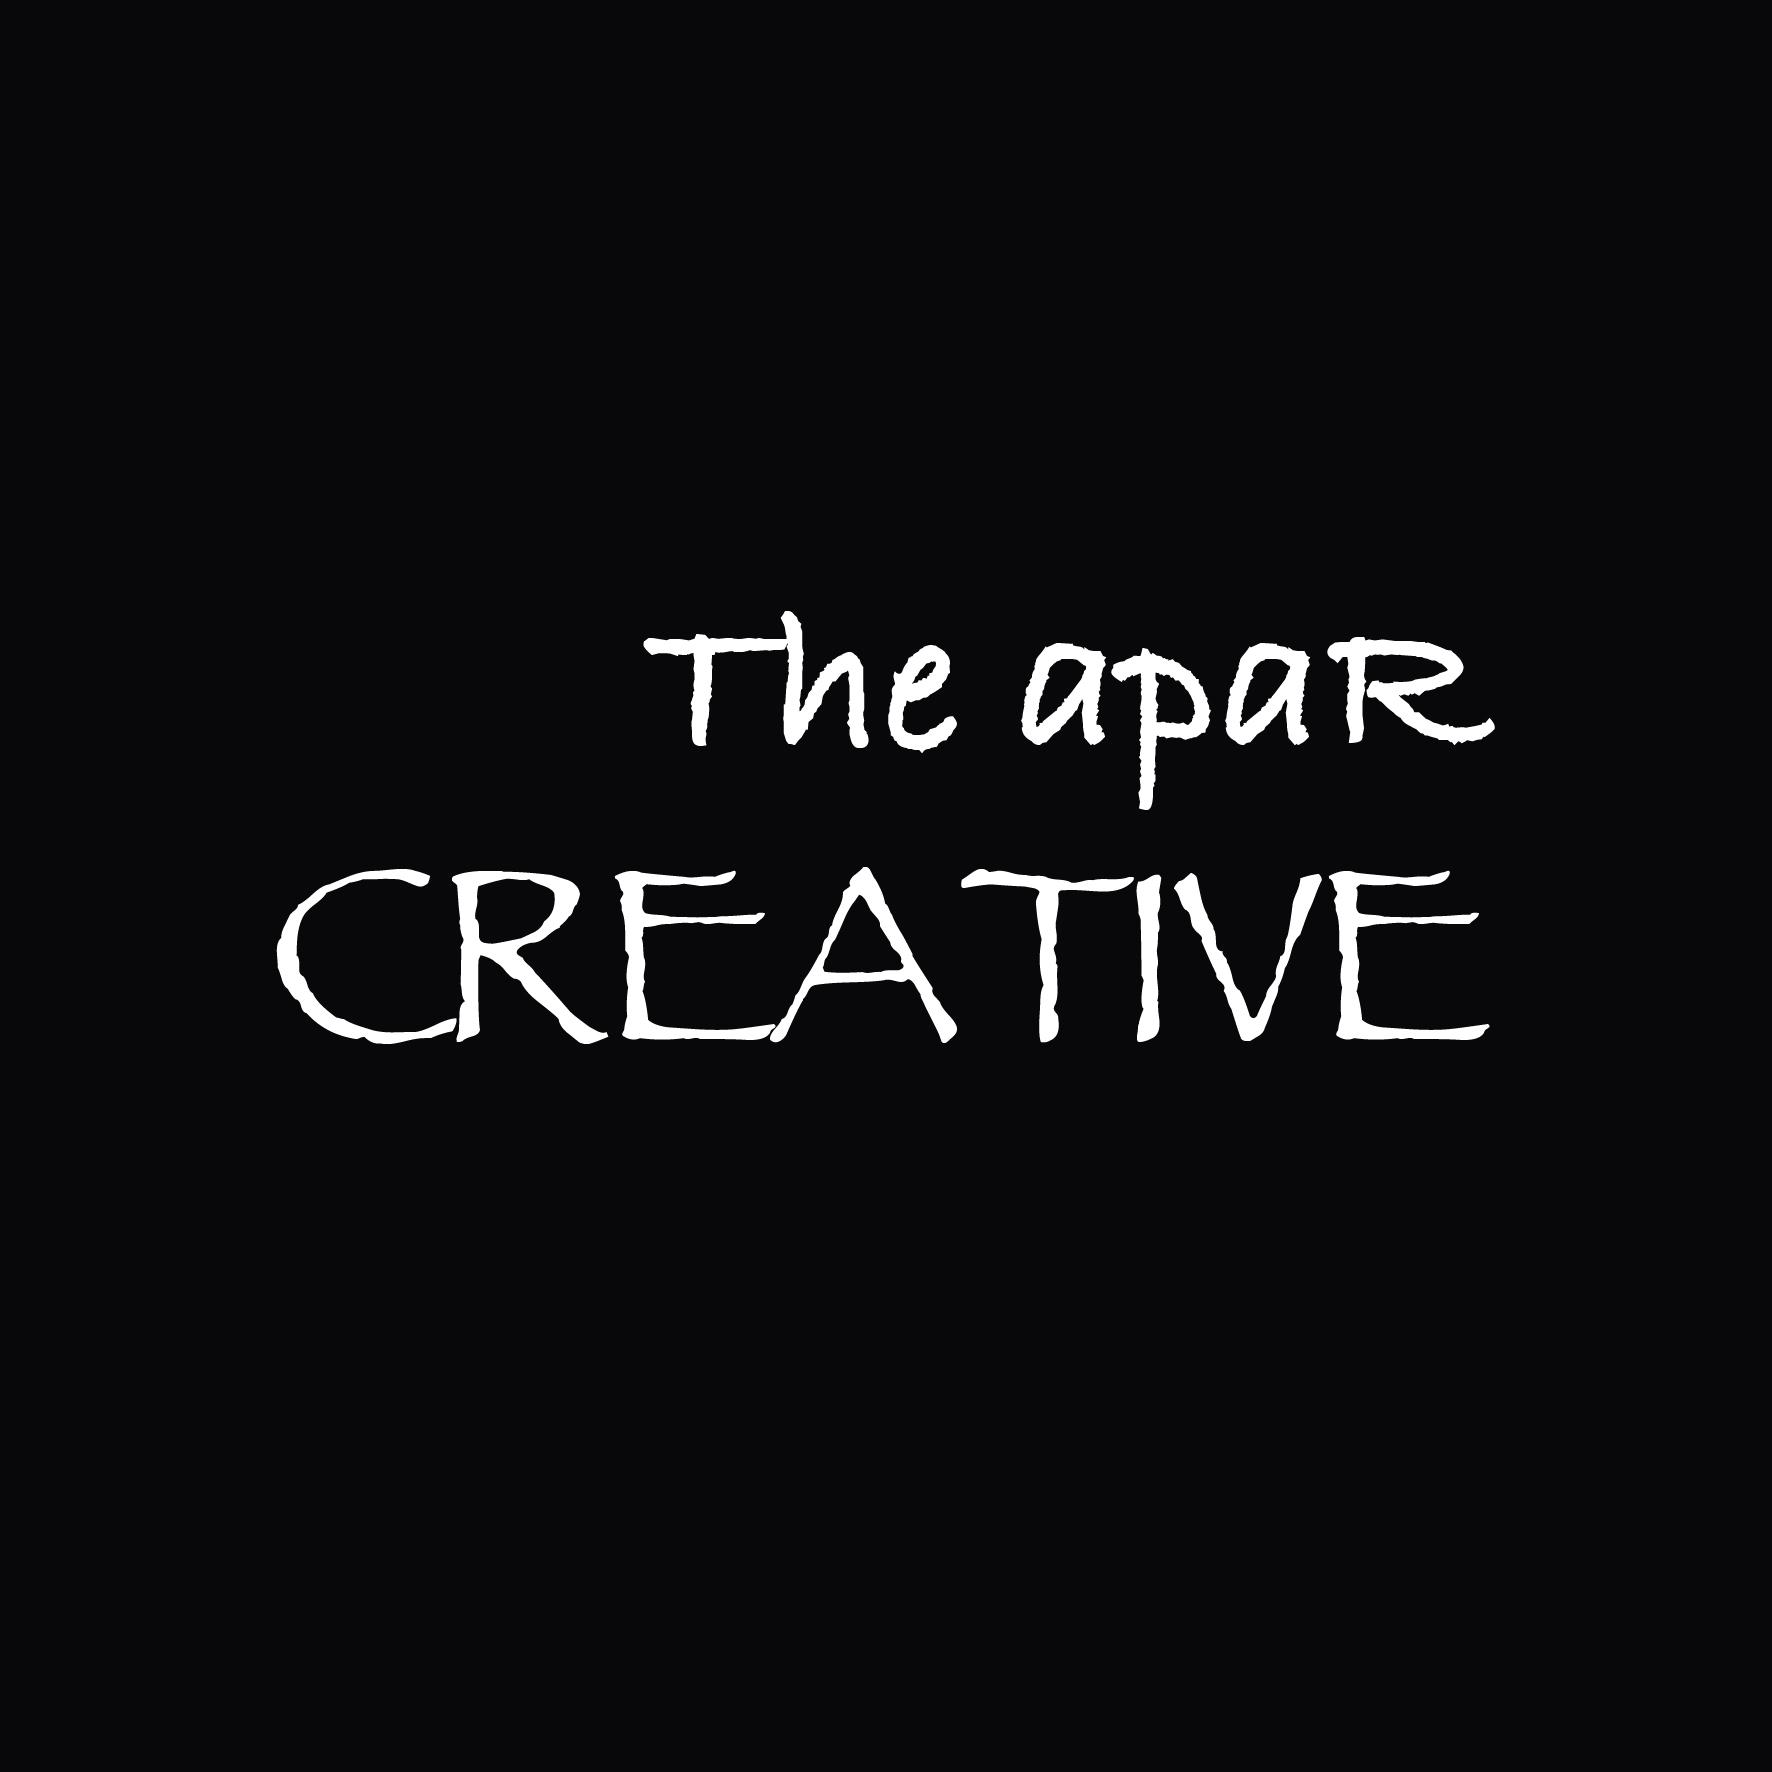 Apar title2 creative